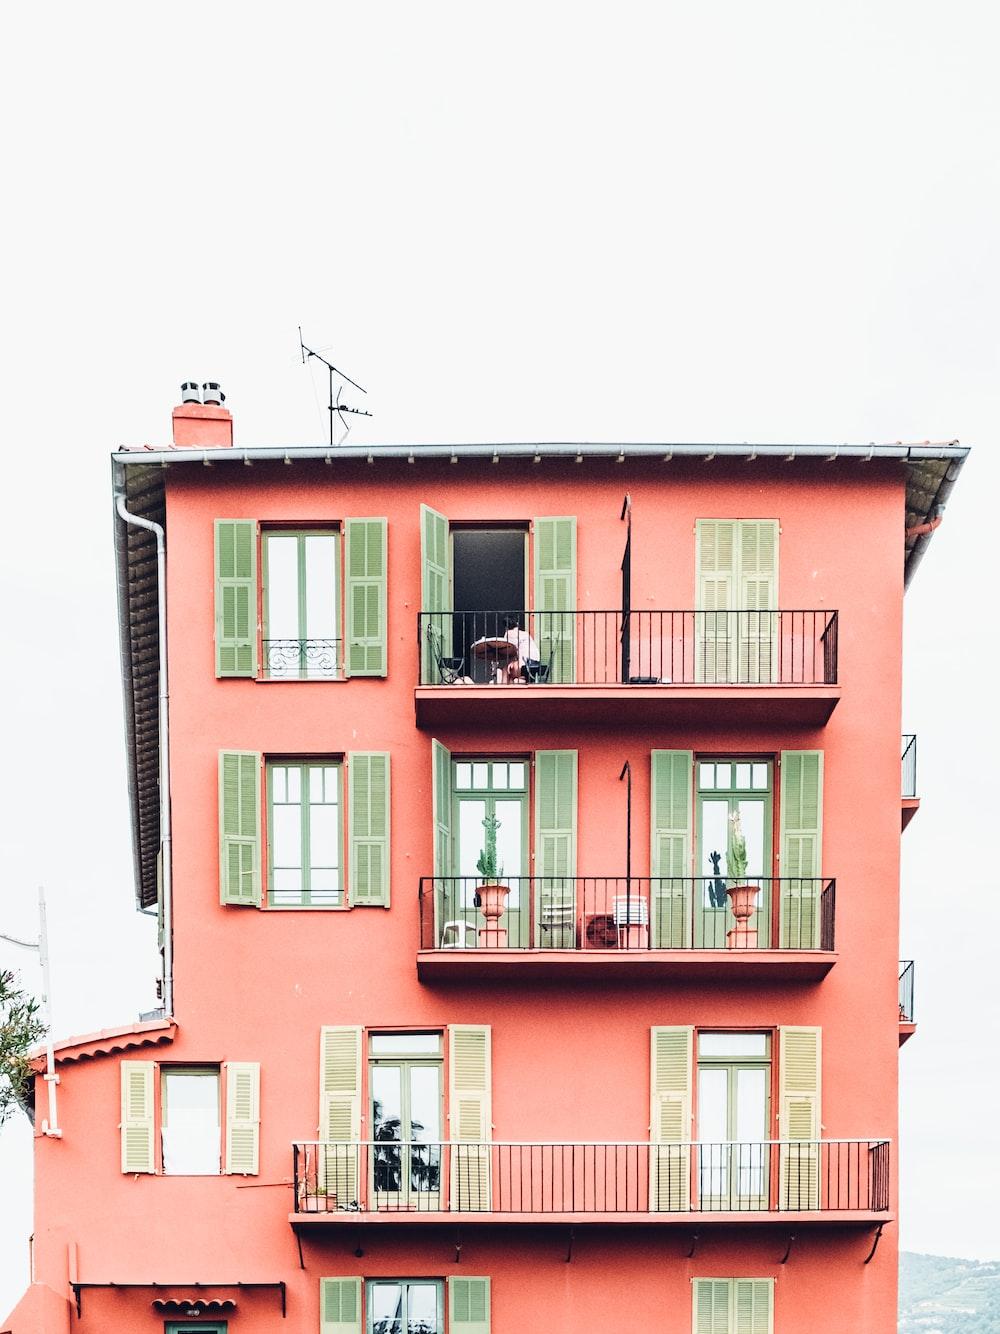 orange and green 4-storey building